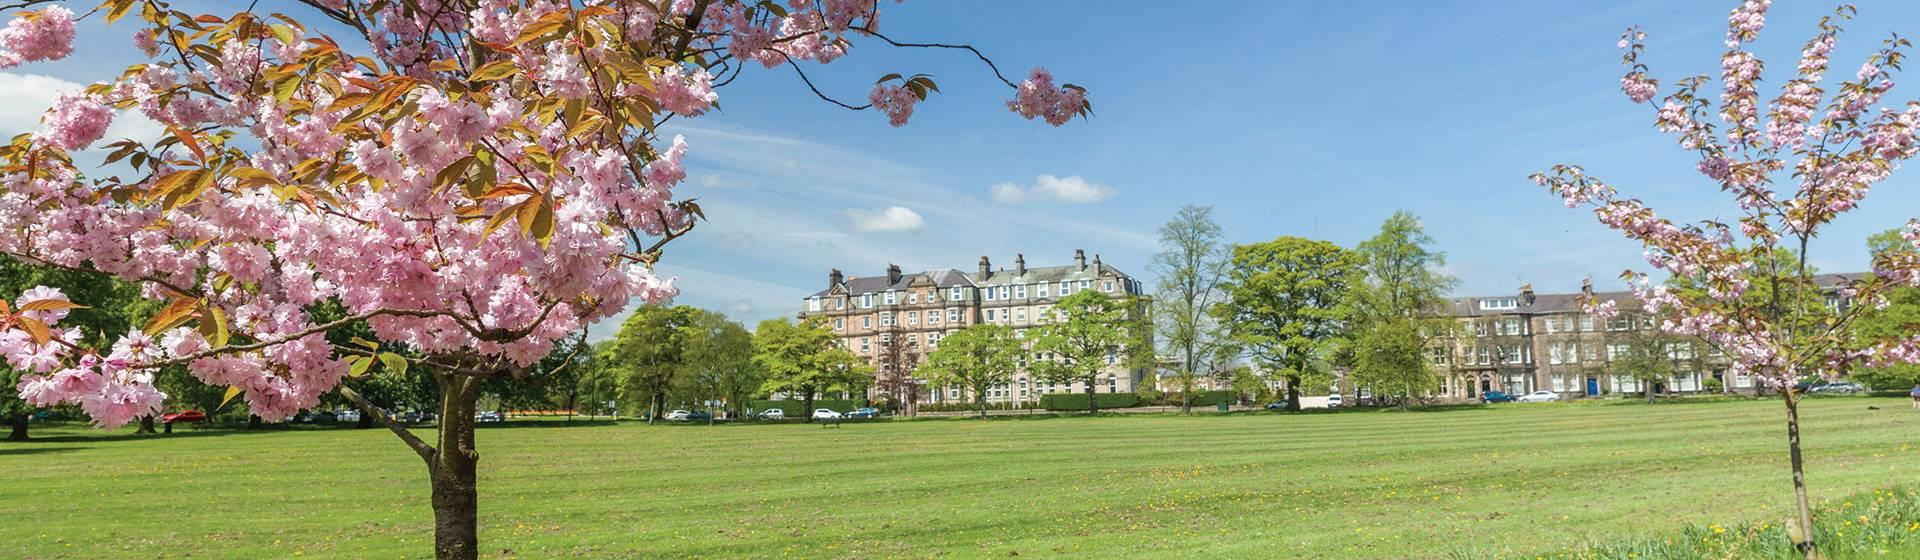 Harrogate & Holmfirth in Springtime